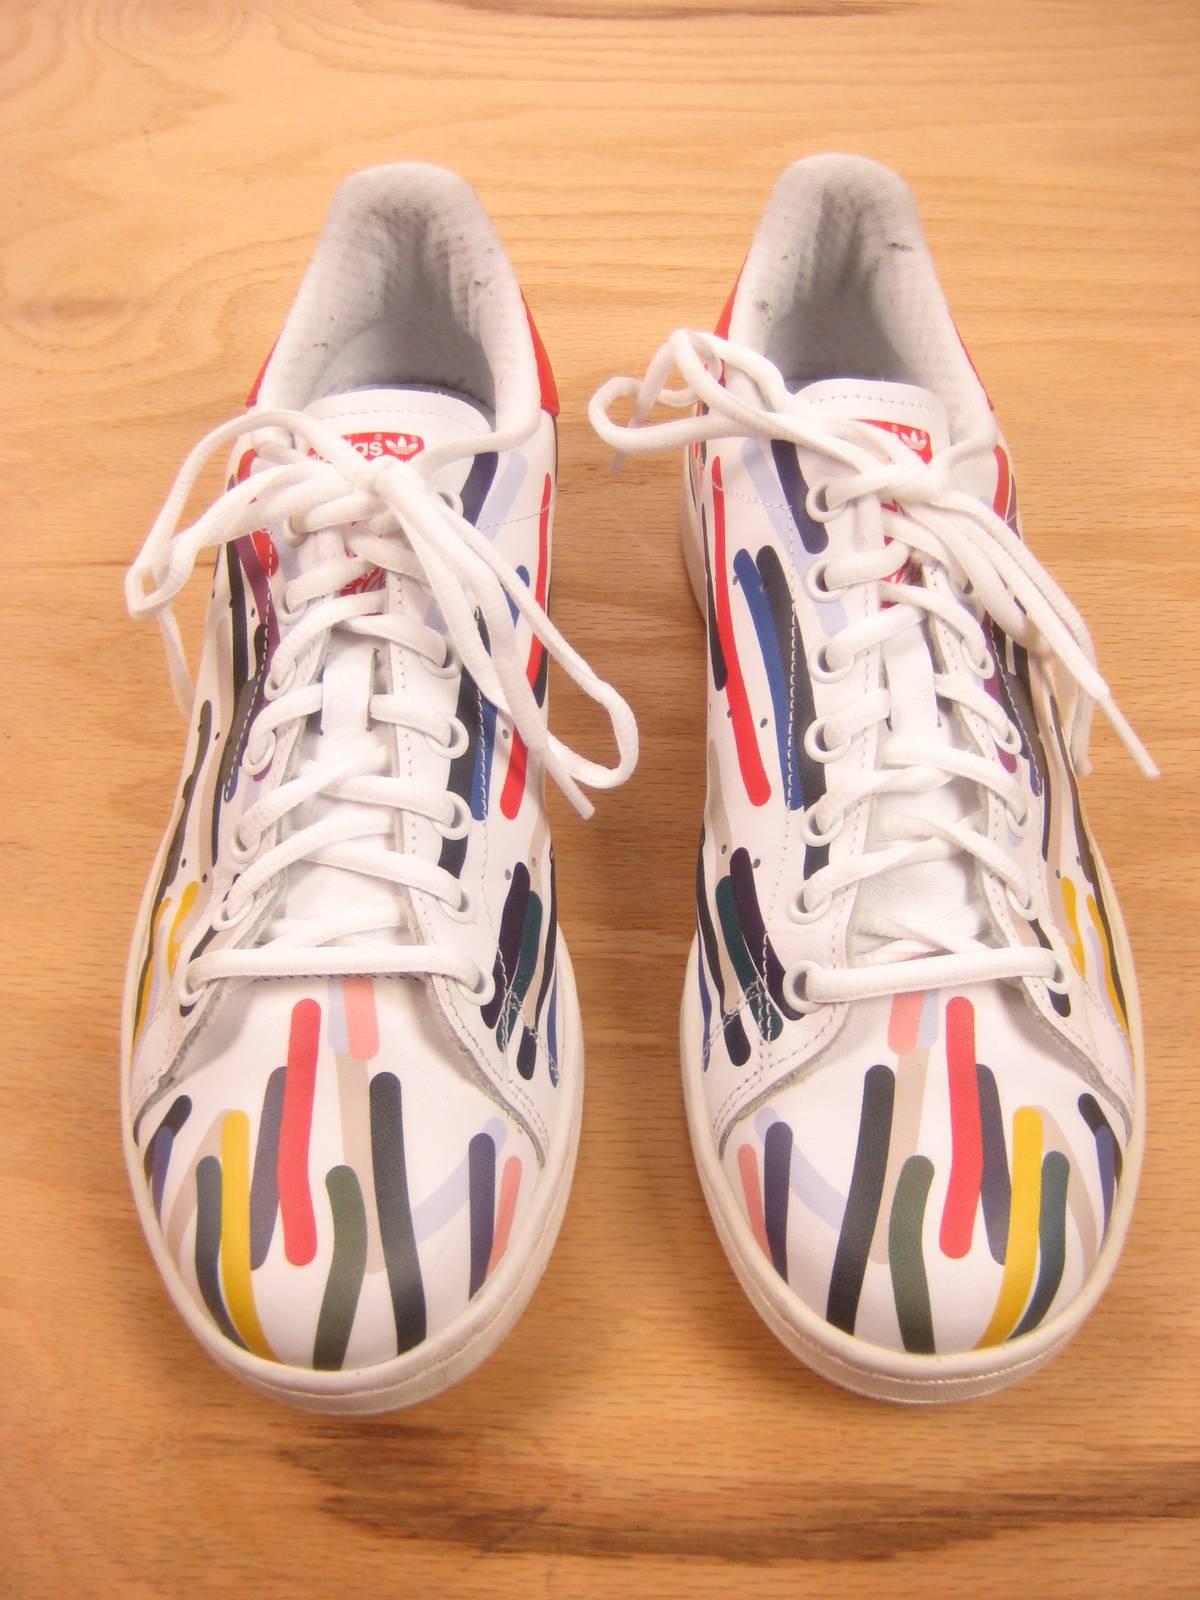 best website ec0d0 2239b Adidas Stan Smith Multi Color Low Top Sneakers 9 Size 9 $64